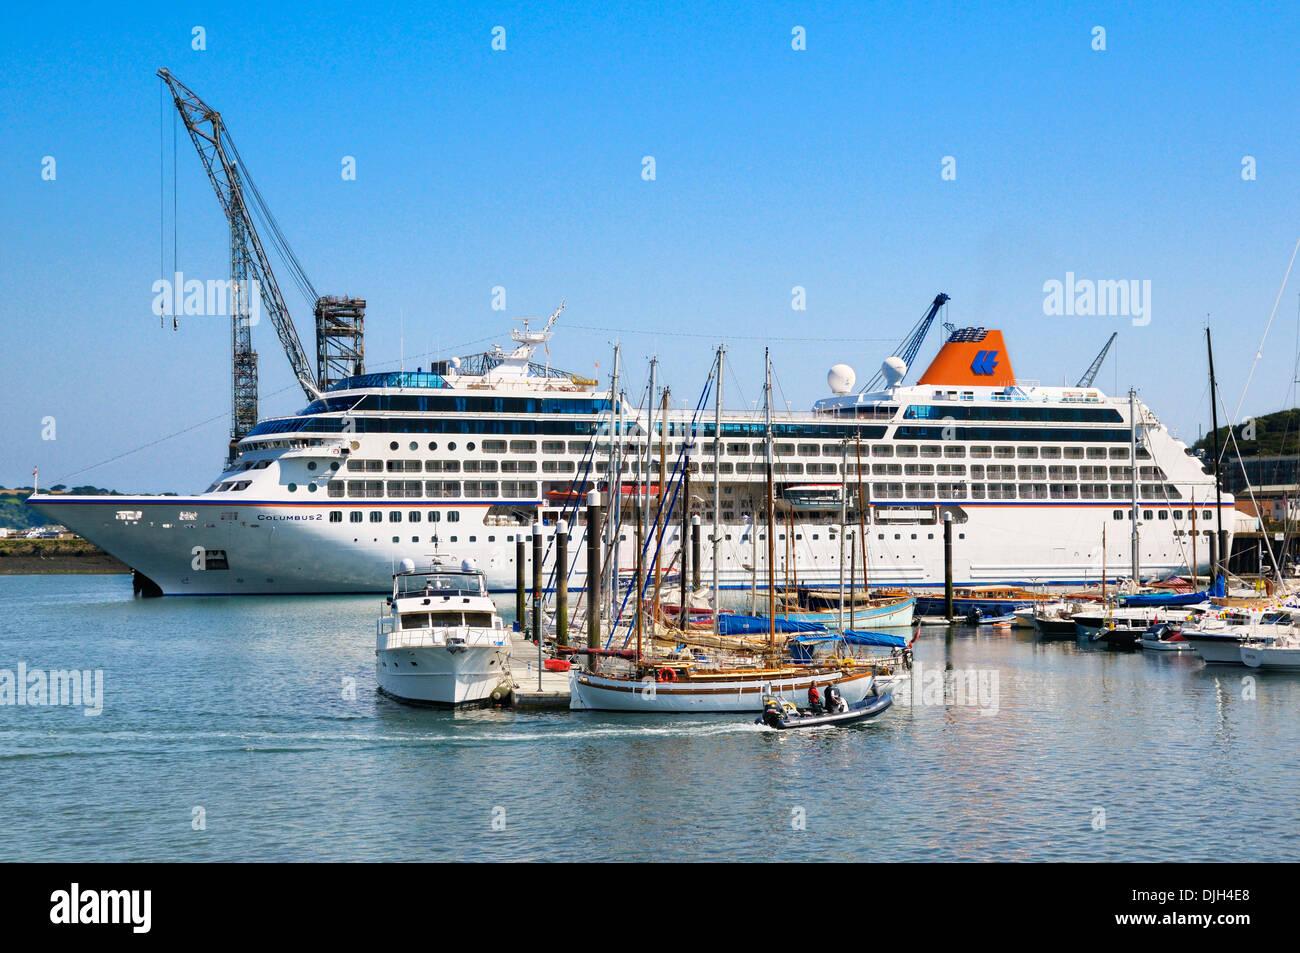 Cruise ship Columbus II docked in Falmouth, Cornwall, UK - Stock Image